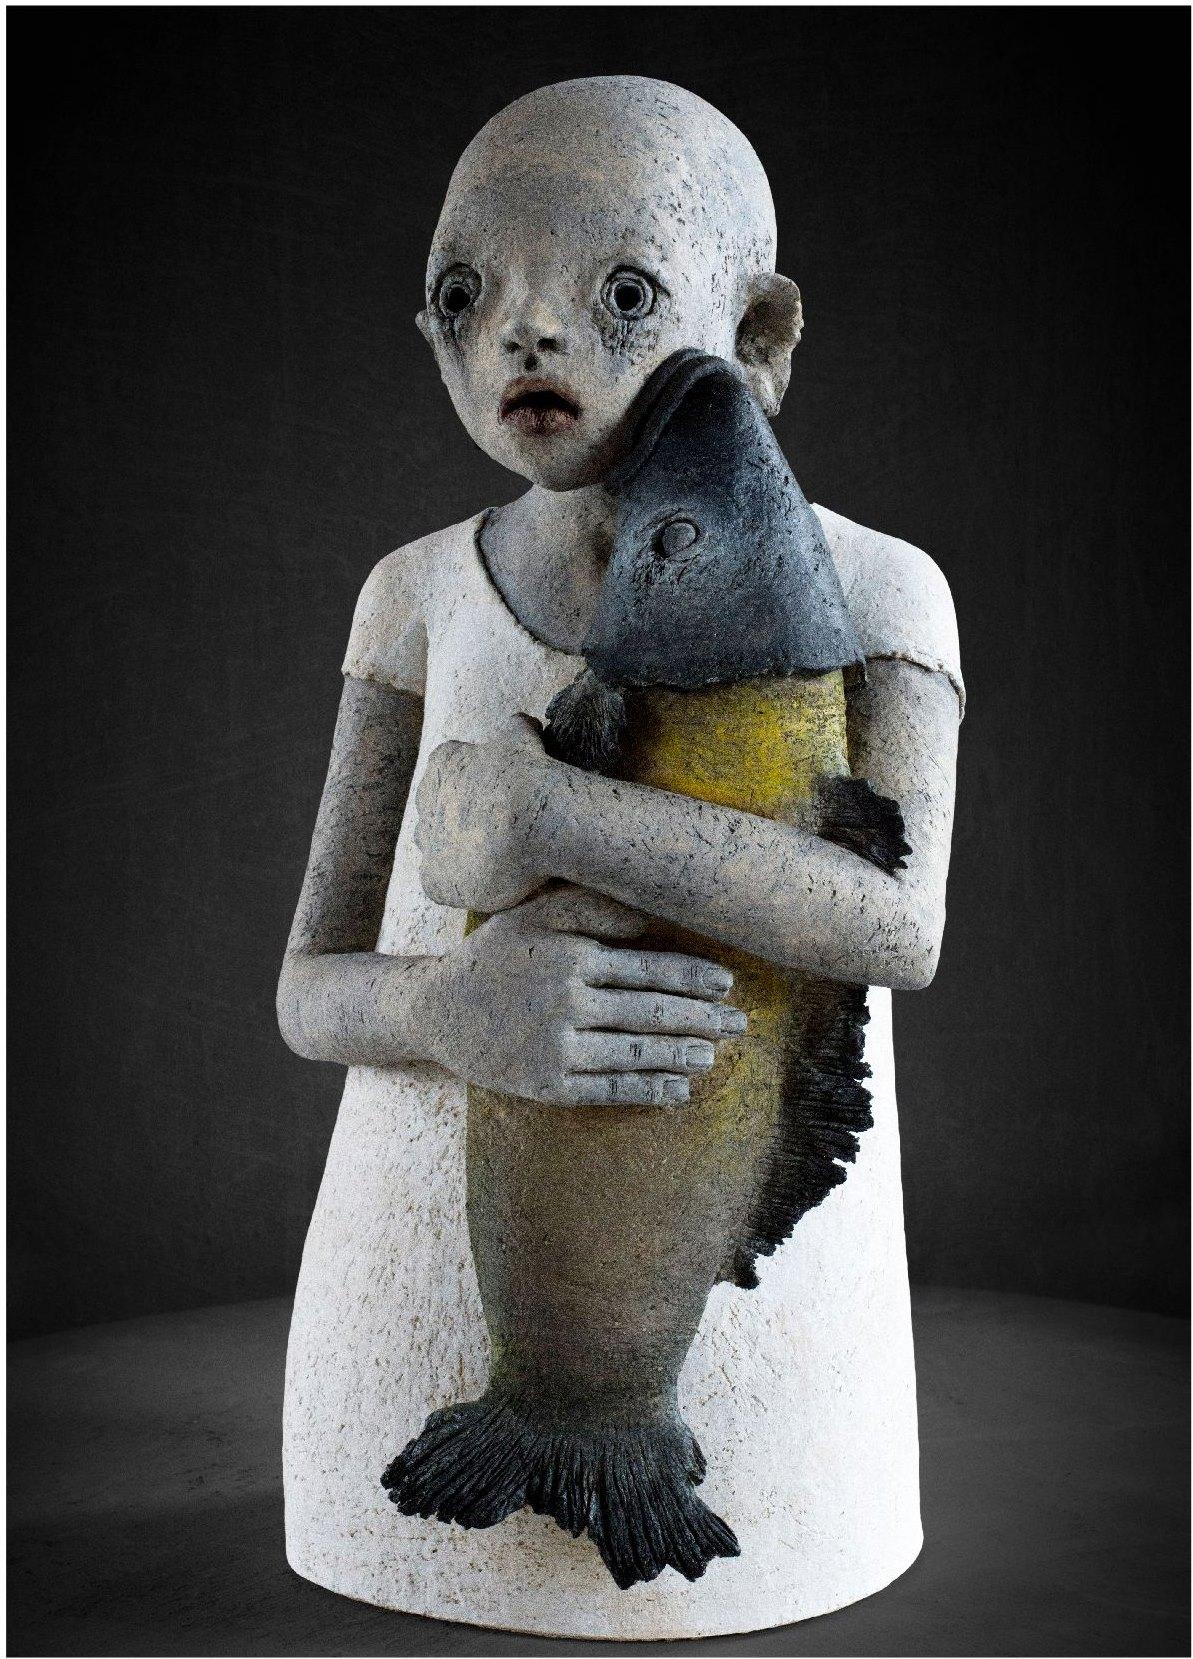 Nathalie Gauglin – Galerie Albane à Nantes du 9 au 26 avril 2014